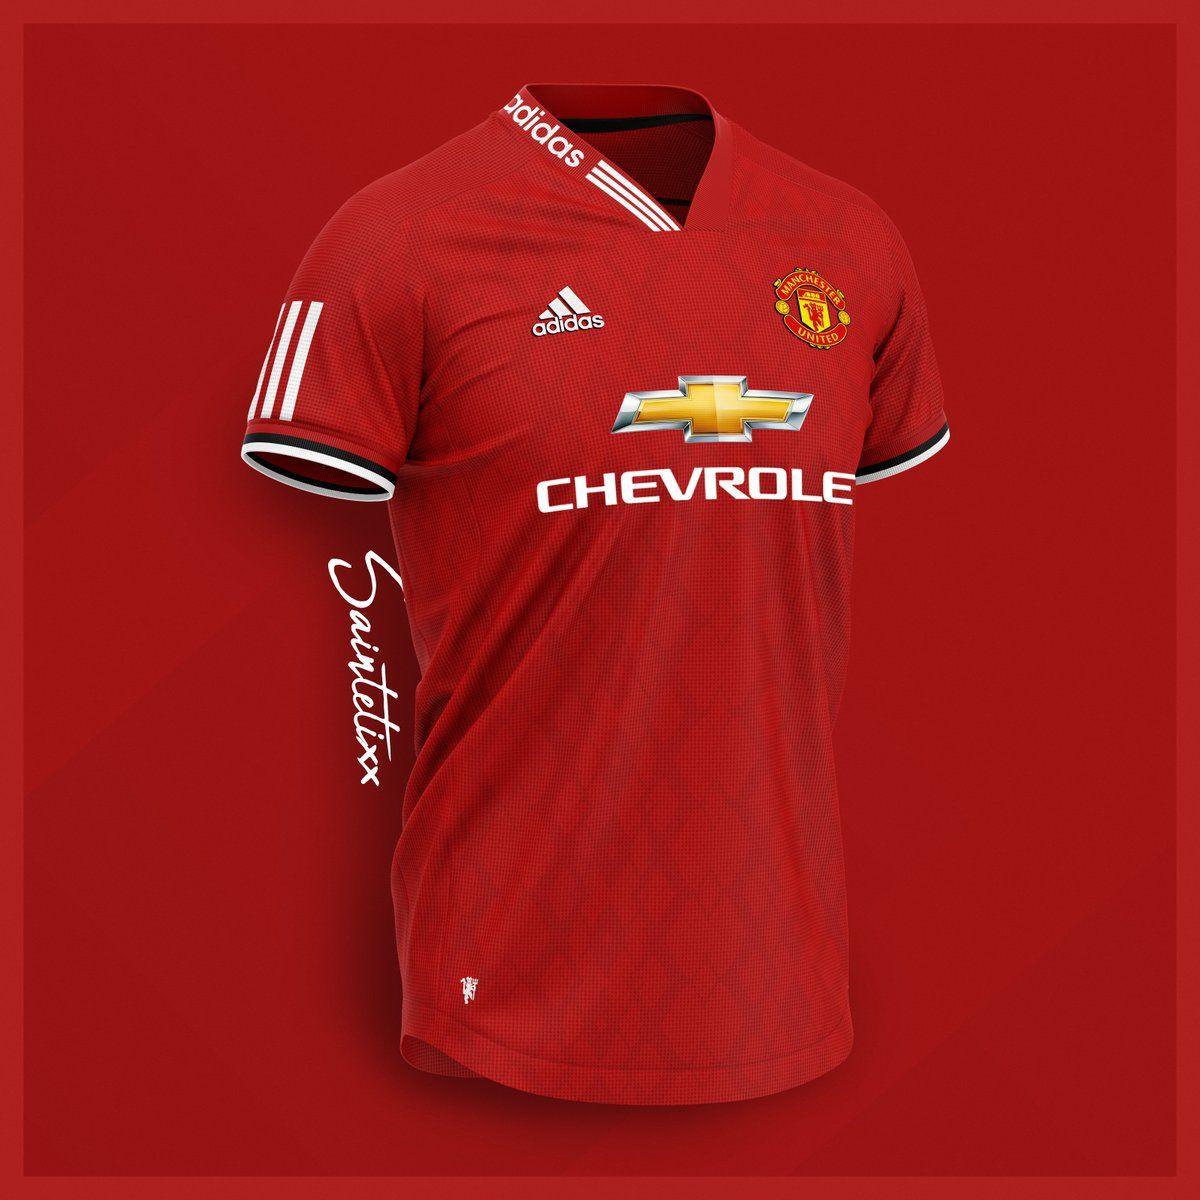 Saintetixx Saintetixx Twitter Manchester United Manchester Shirts